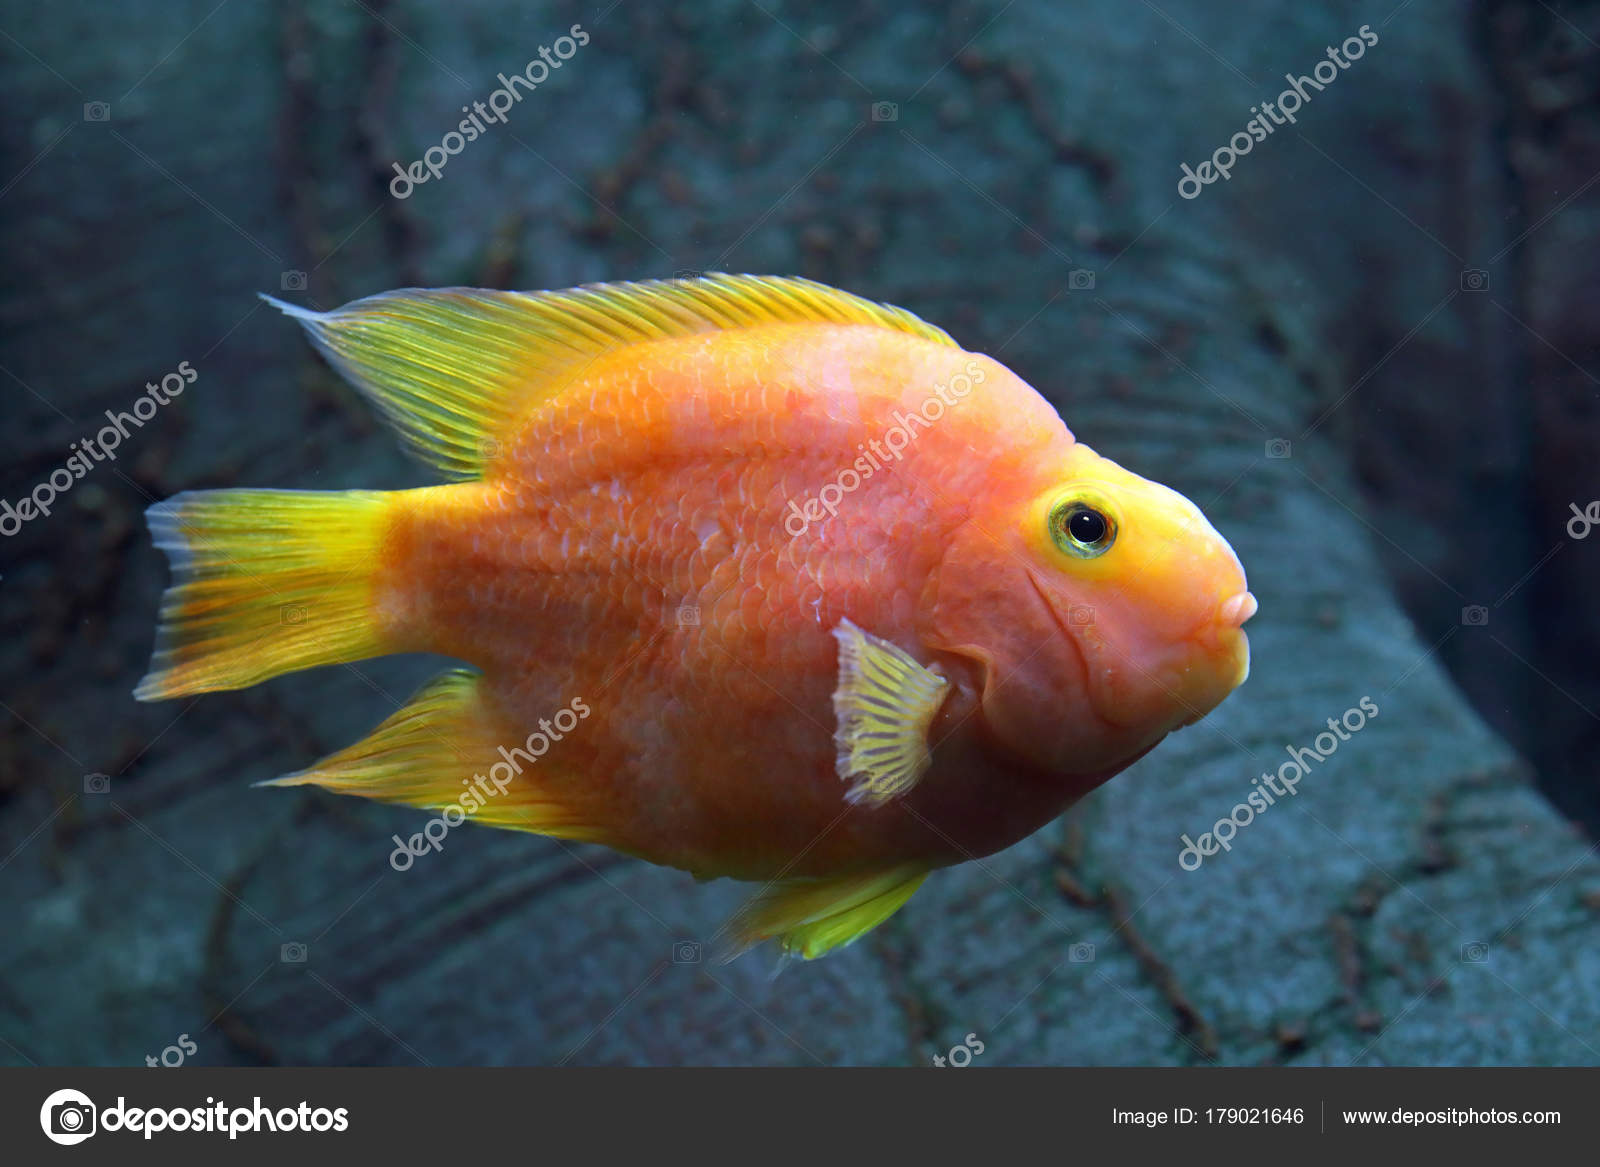 red parrot cichlid aquarium fish colorful parrot closeup stock